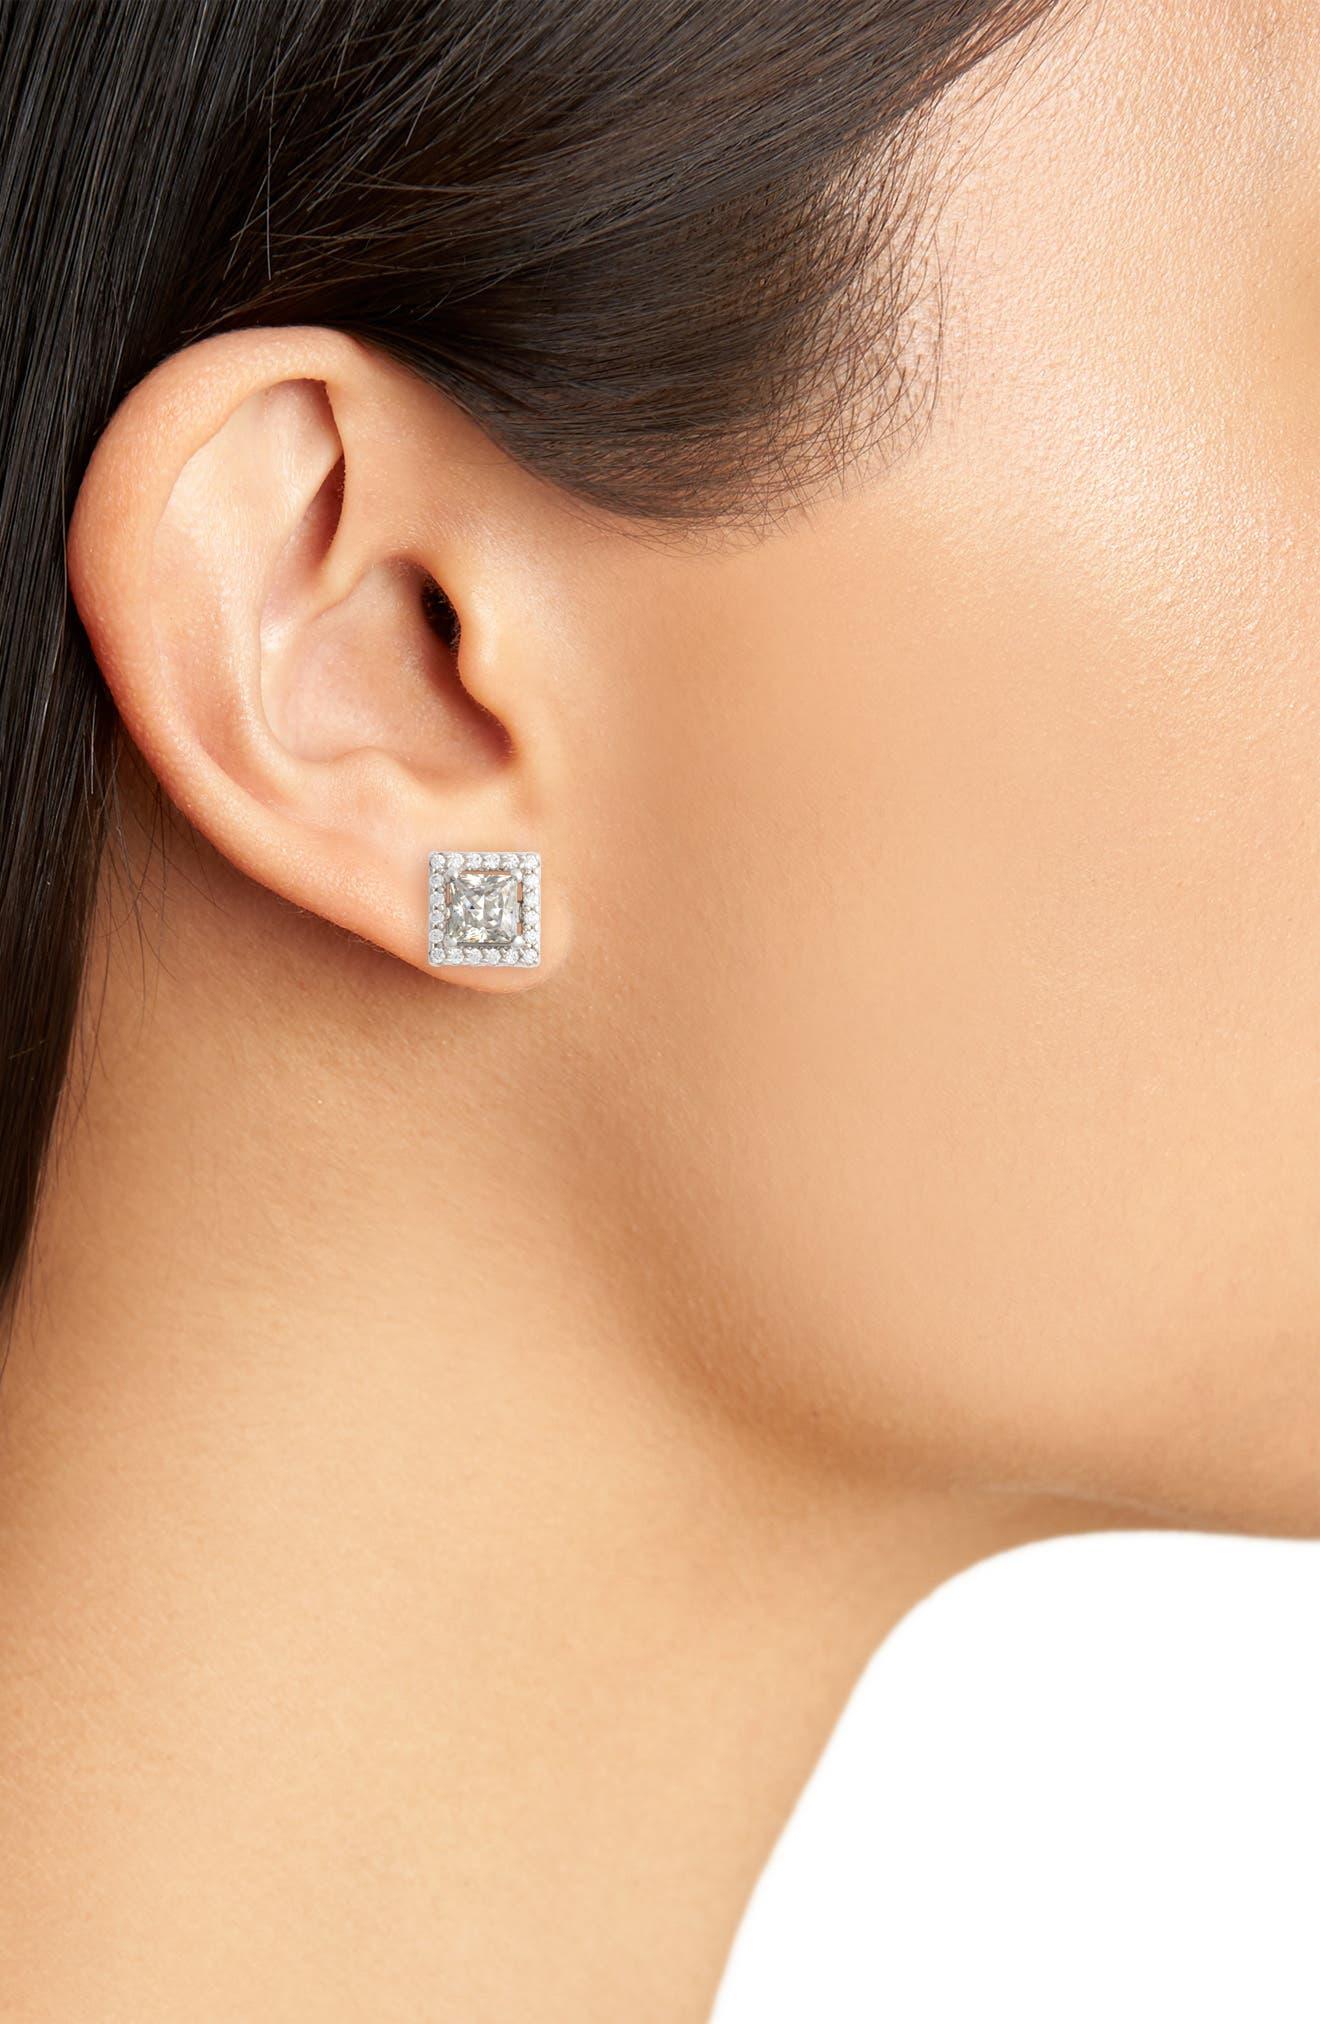 Princess Cut Simulated Diamond Stud Earrings,                             Alternate thumbnail 2, color,                             SILVER/ CLEAR